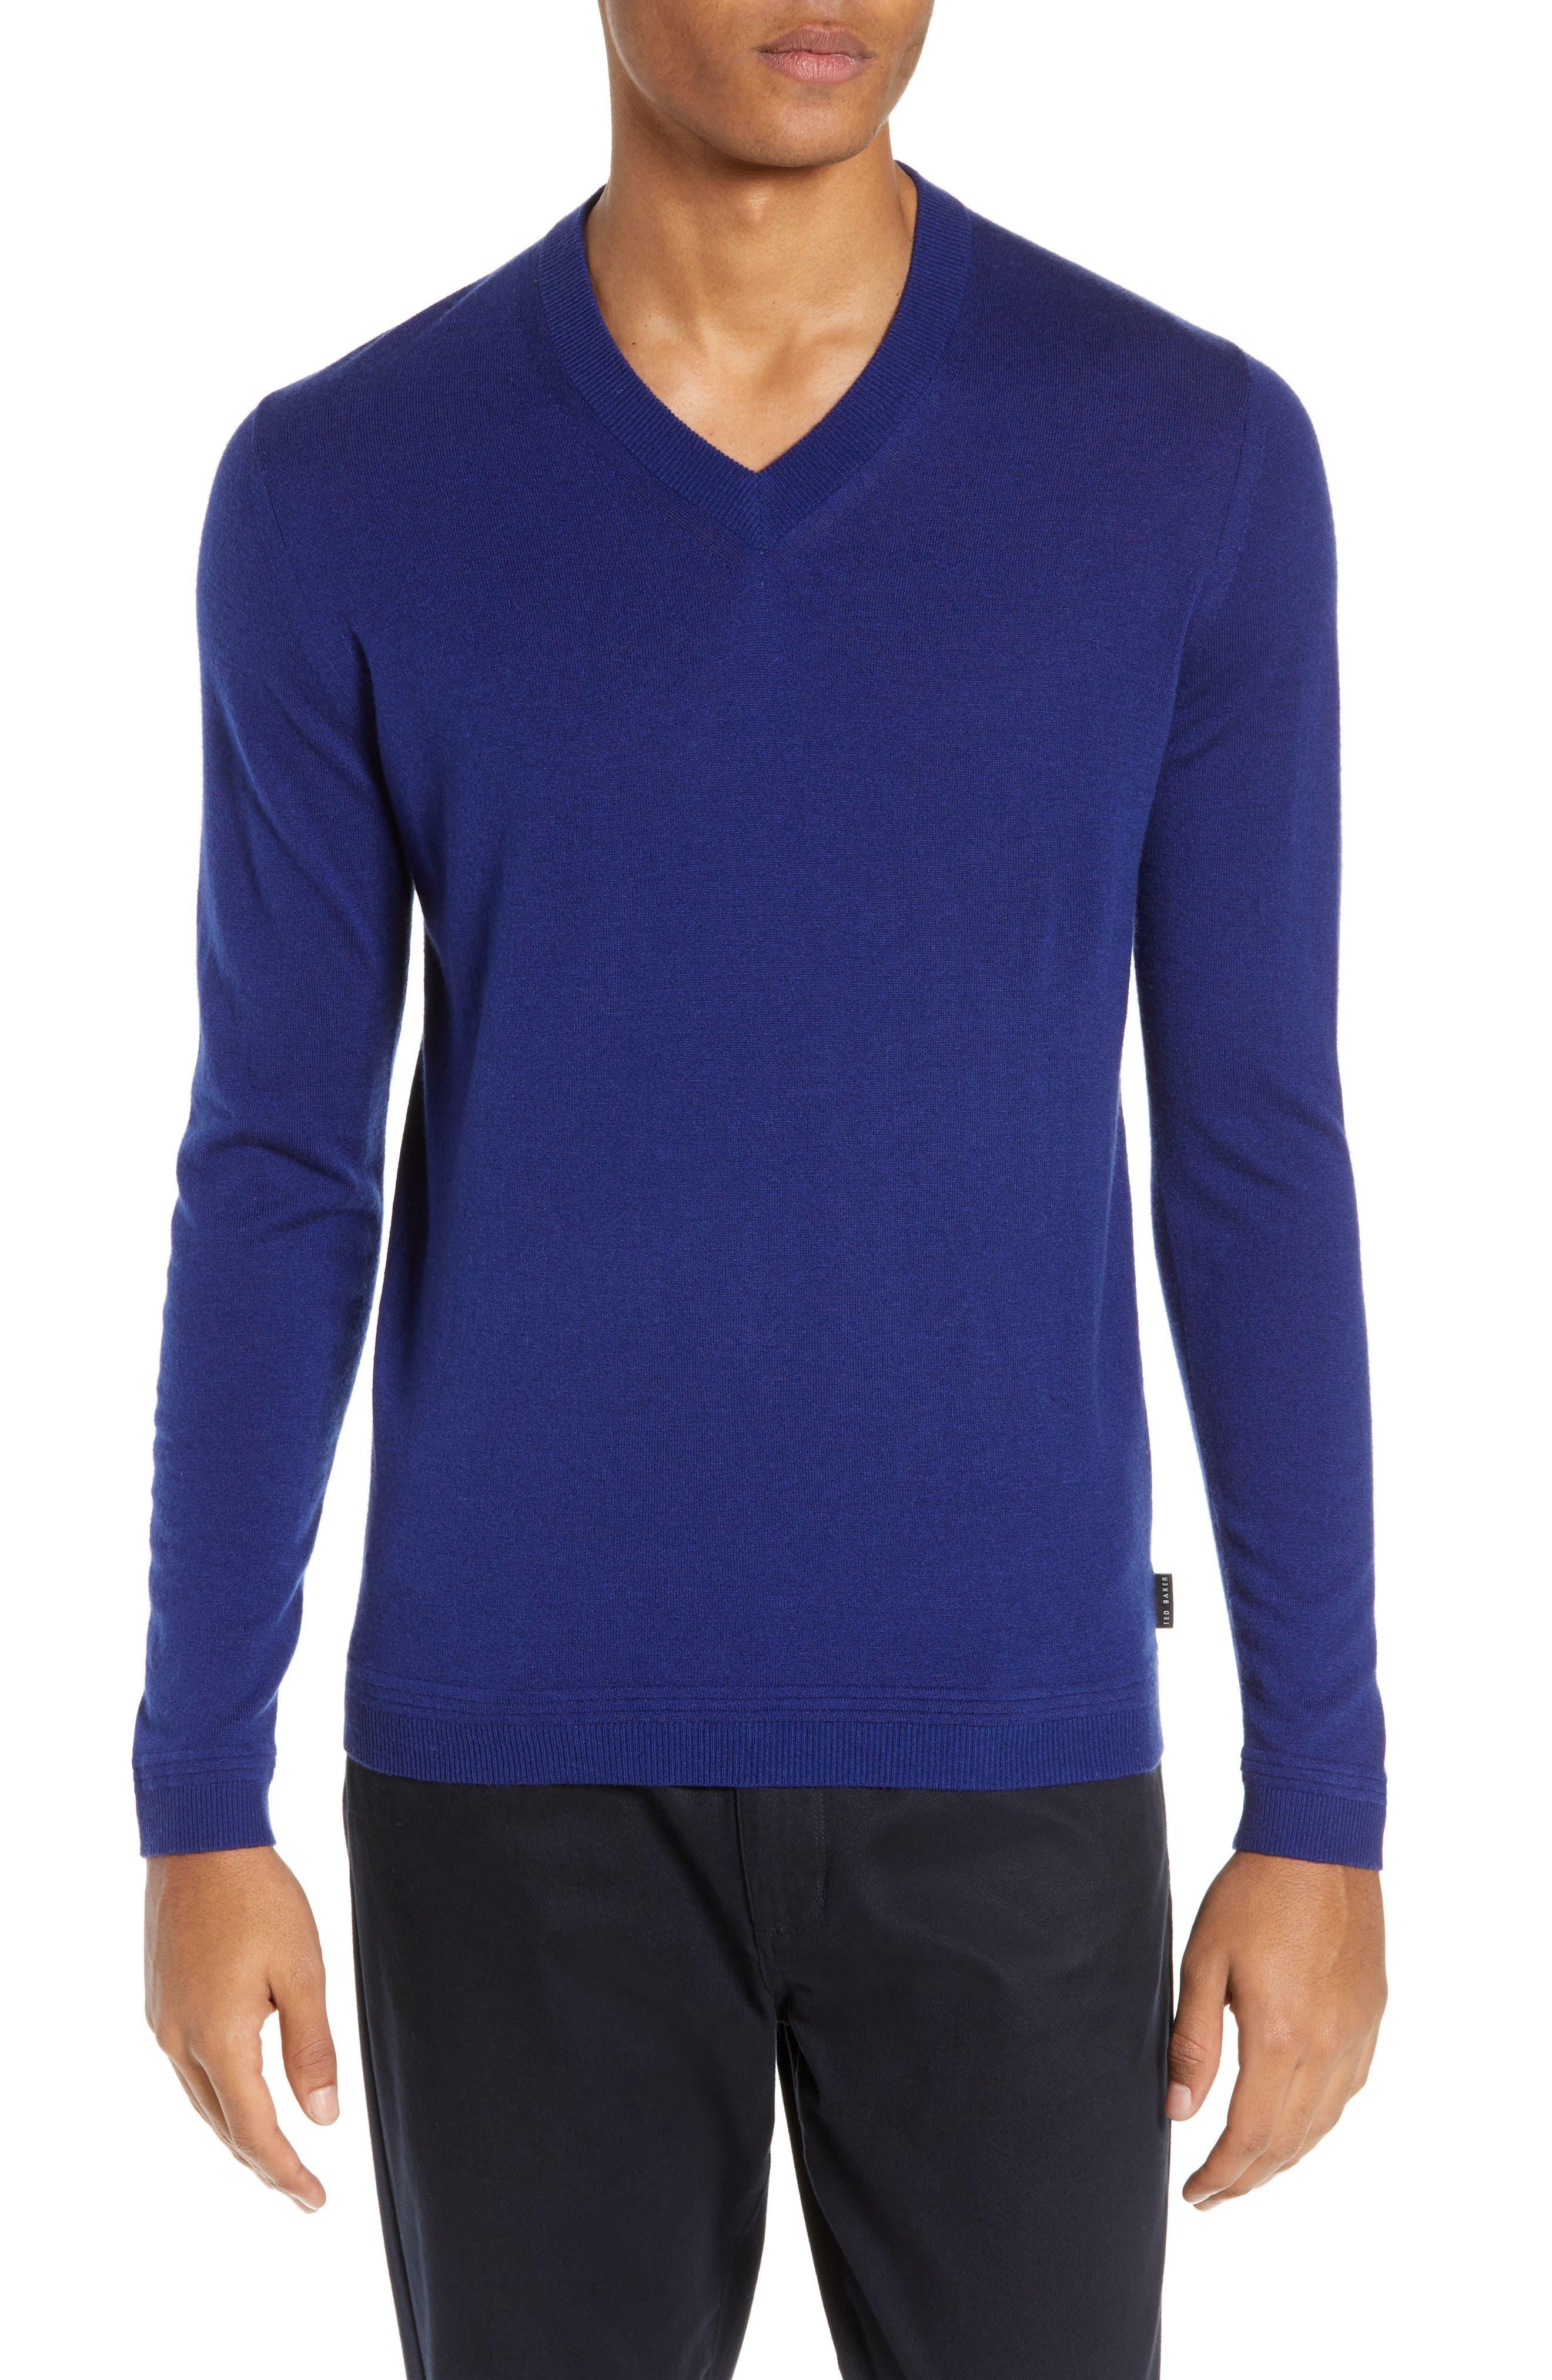 Ted Baker London Noel Slim Fit V-Neck Wool Blend Sweater